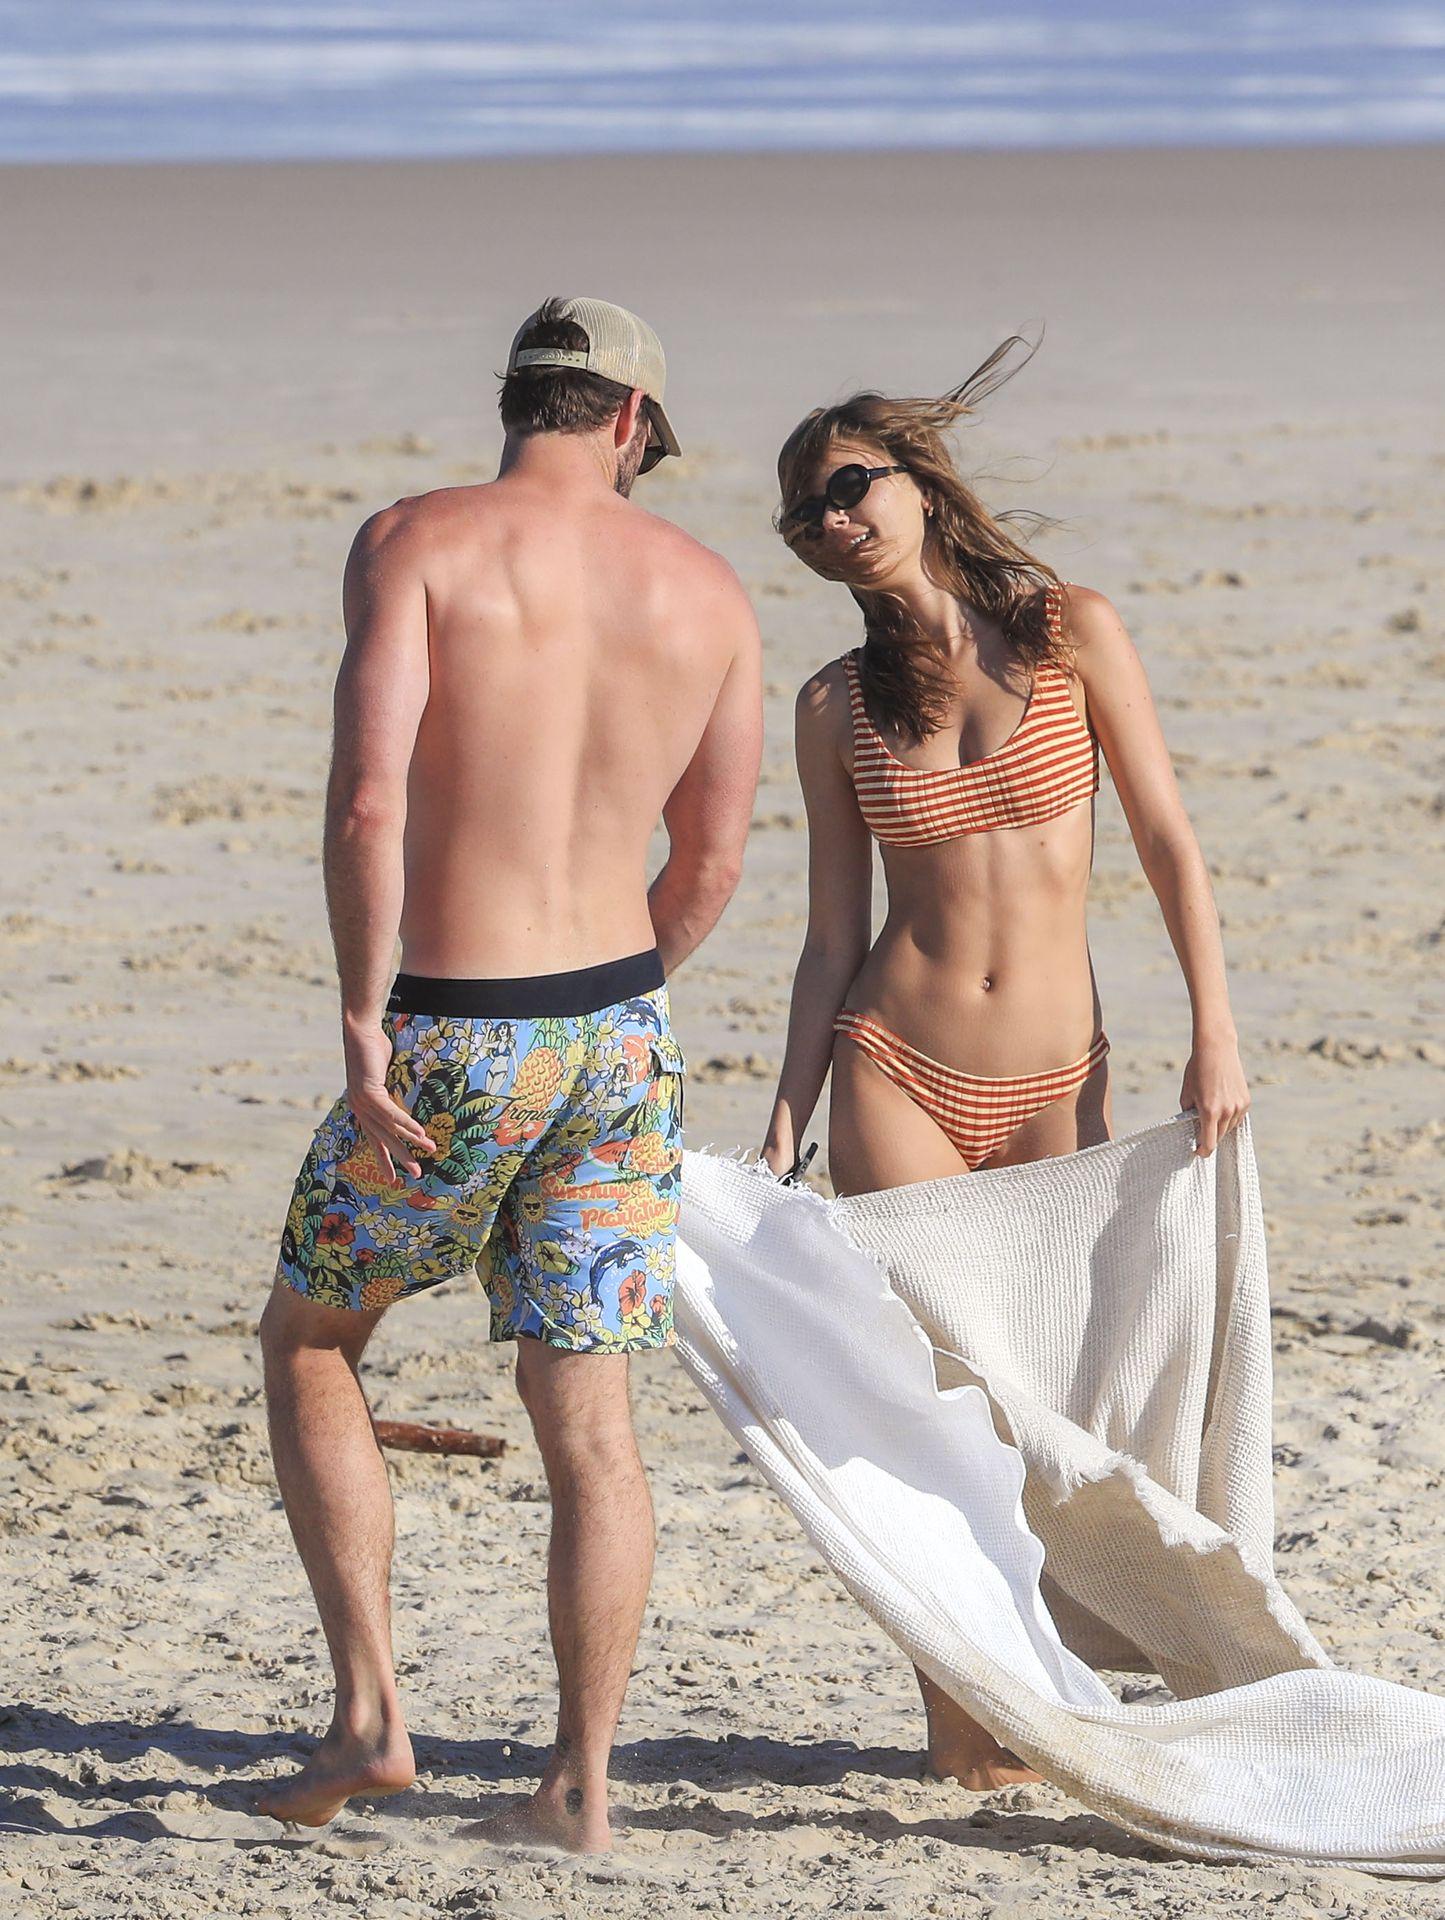 Gabriella Brooks Hot – Liam Hemsworth's New Girlfriend 0057